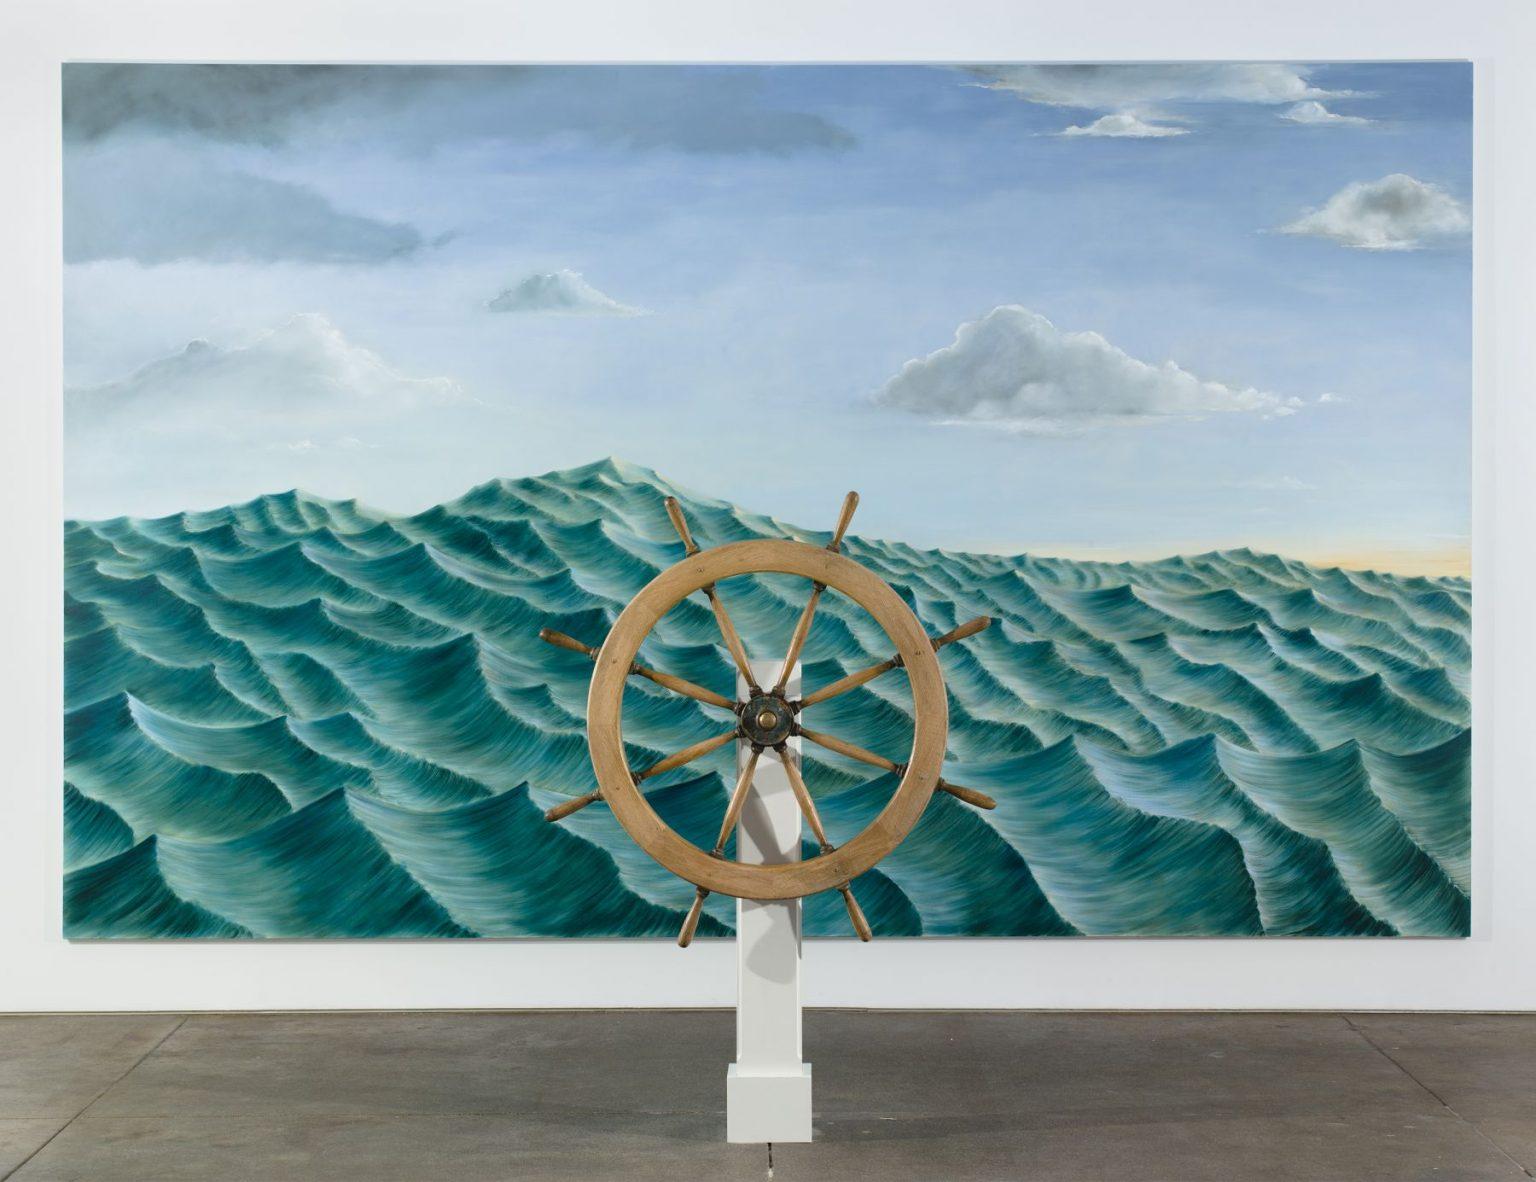 Sean Landers Around the World Alone (Epilogue I) 2011 Oil on linen; Captain's wheel: wood, brass, bronze Painting: 108 x 174 inches, 274.3 x 442 cm Captain's wheel: 65.75 x 11 inches, 167 x 27.9 cm